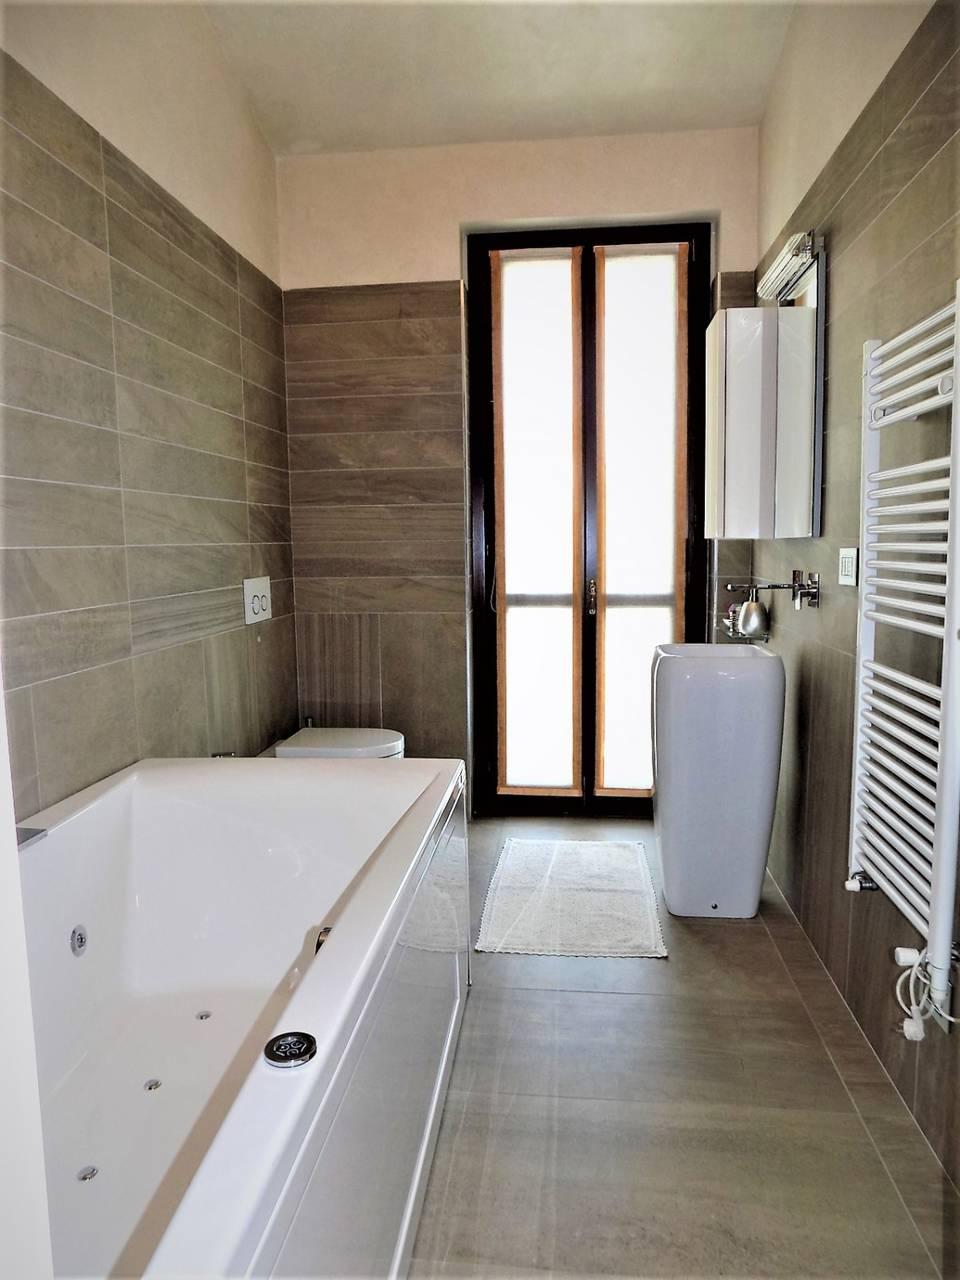 Porzione-villa-bifamigliare-ristrutturata-in-vendita-a-Carnate-12